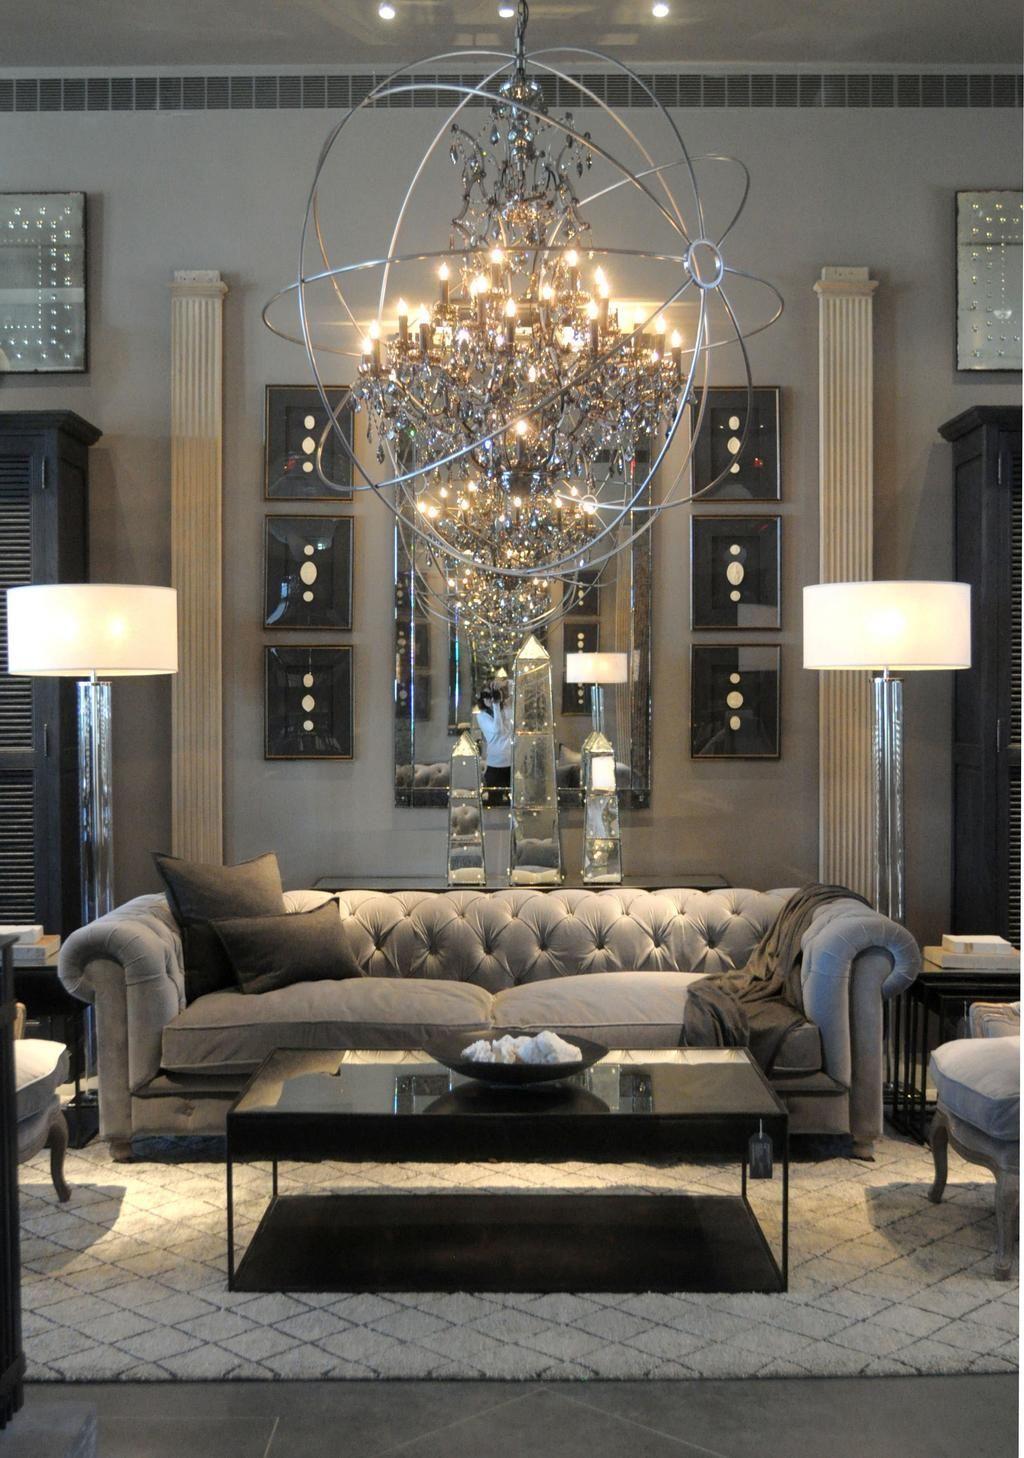 43 modern glam living room decorating ideas elegant on beautiful modern black white living room inspired id=39247